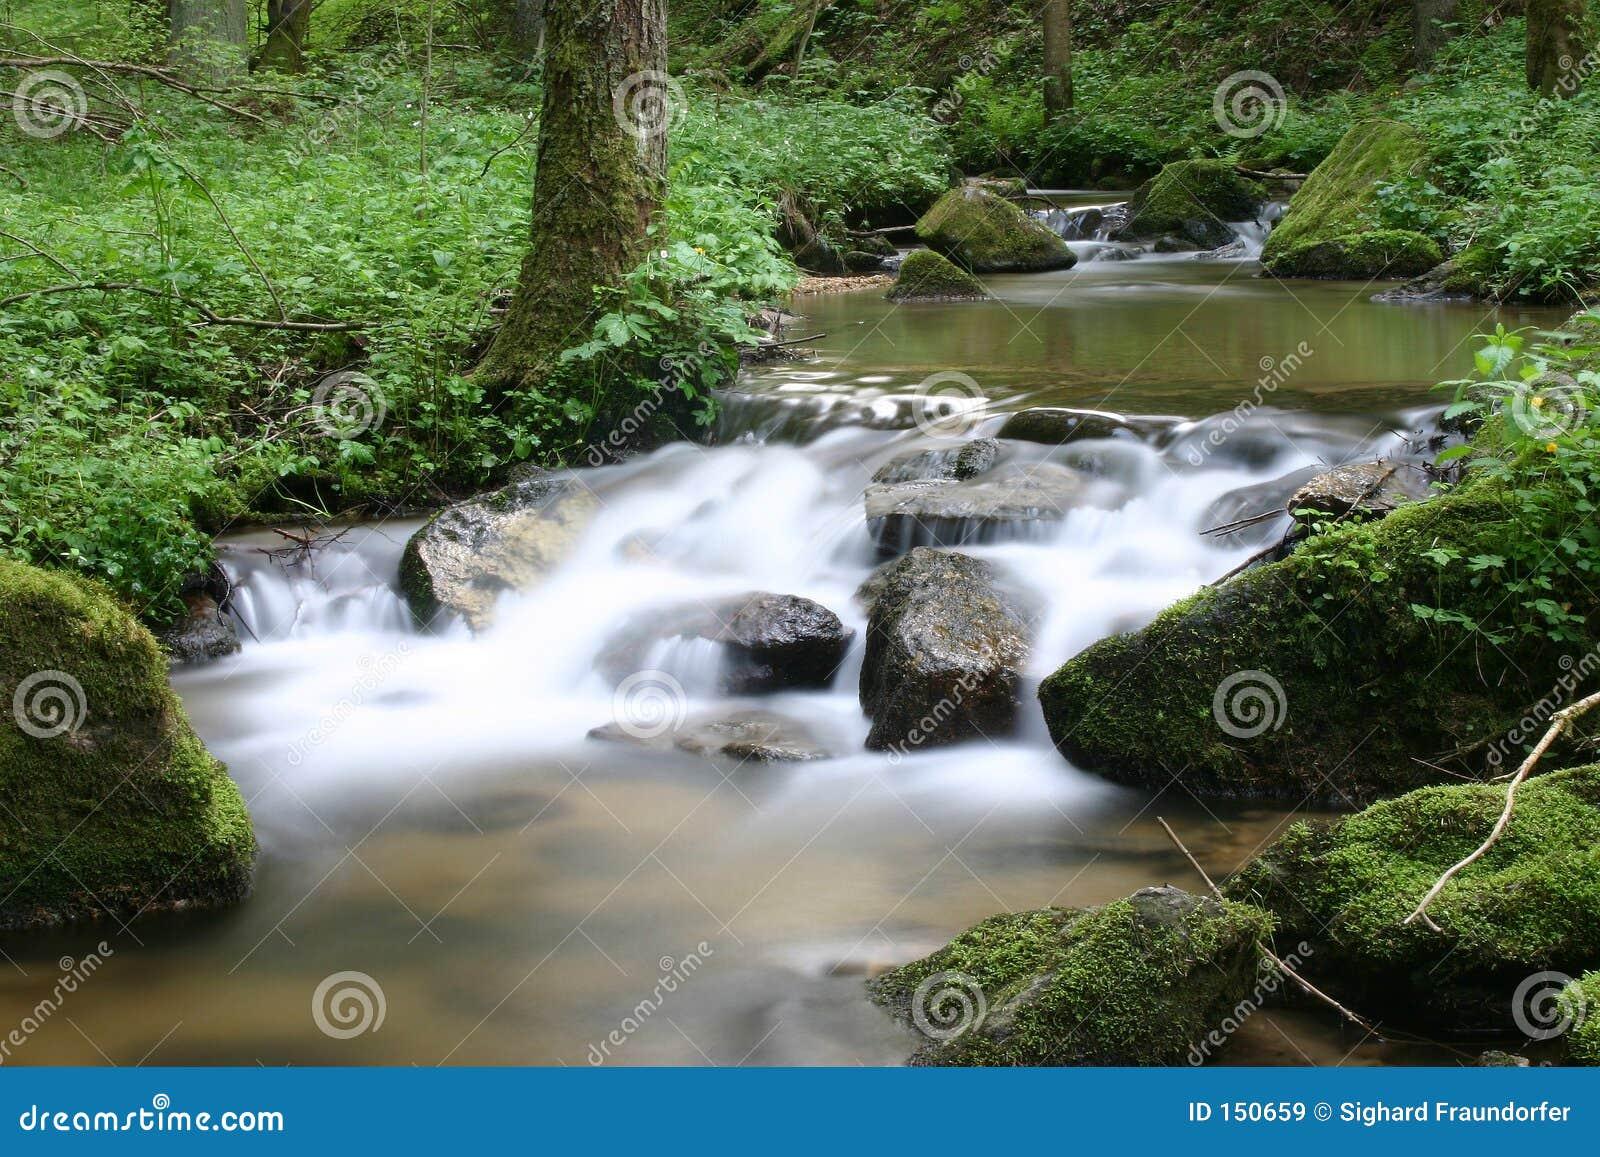 Cascades of water